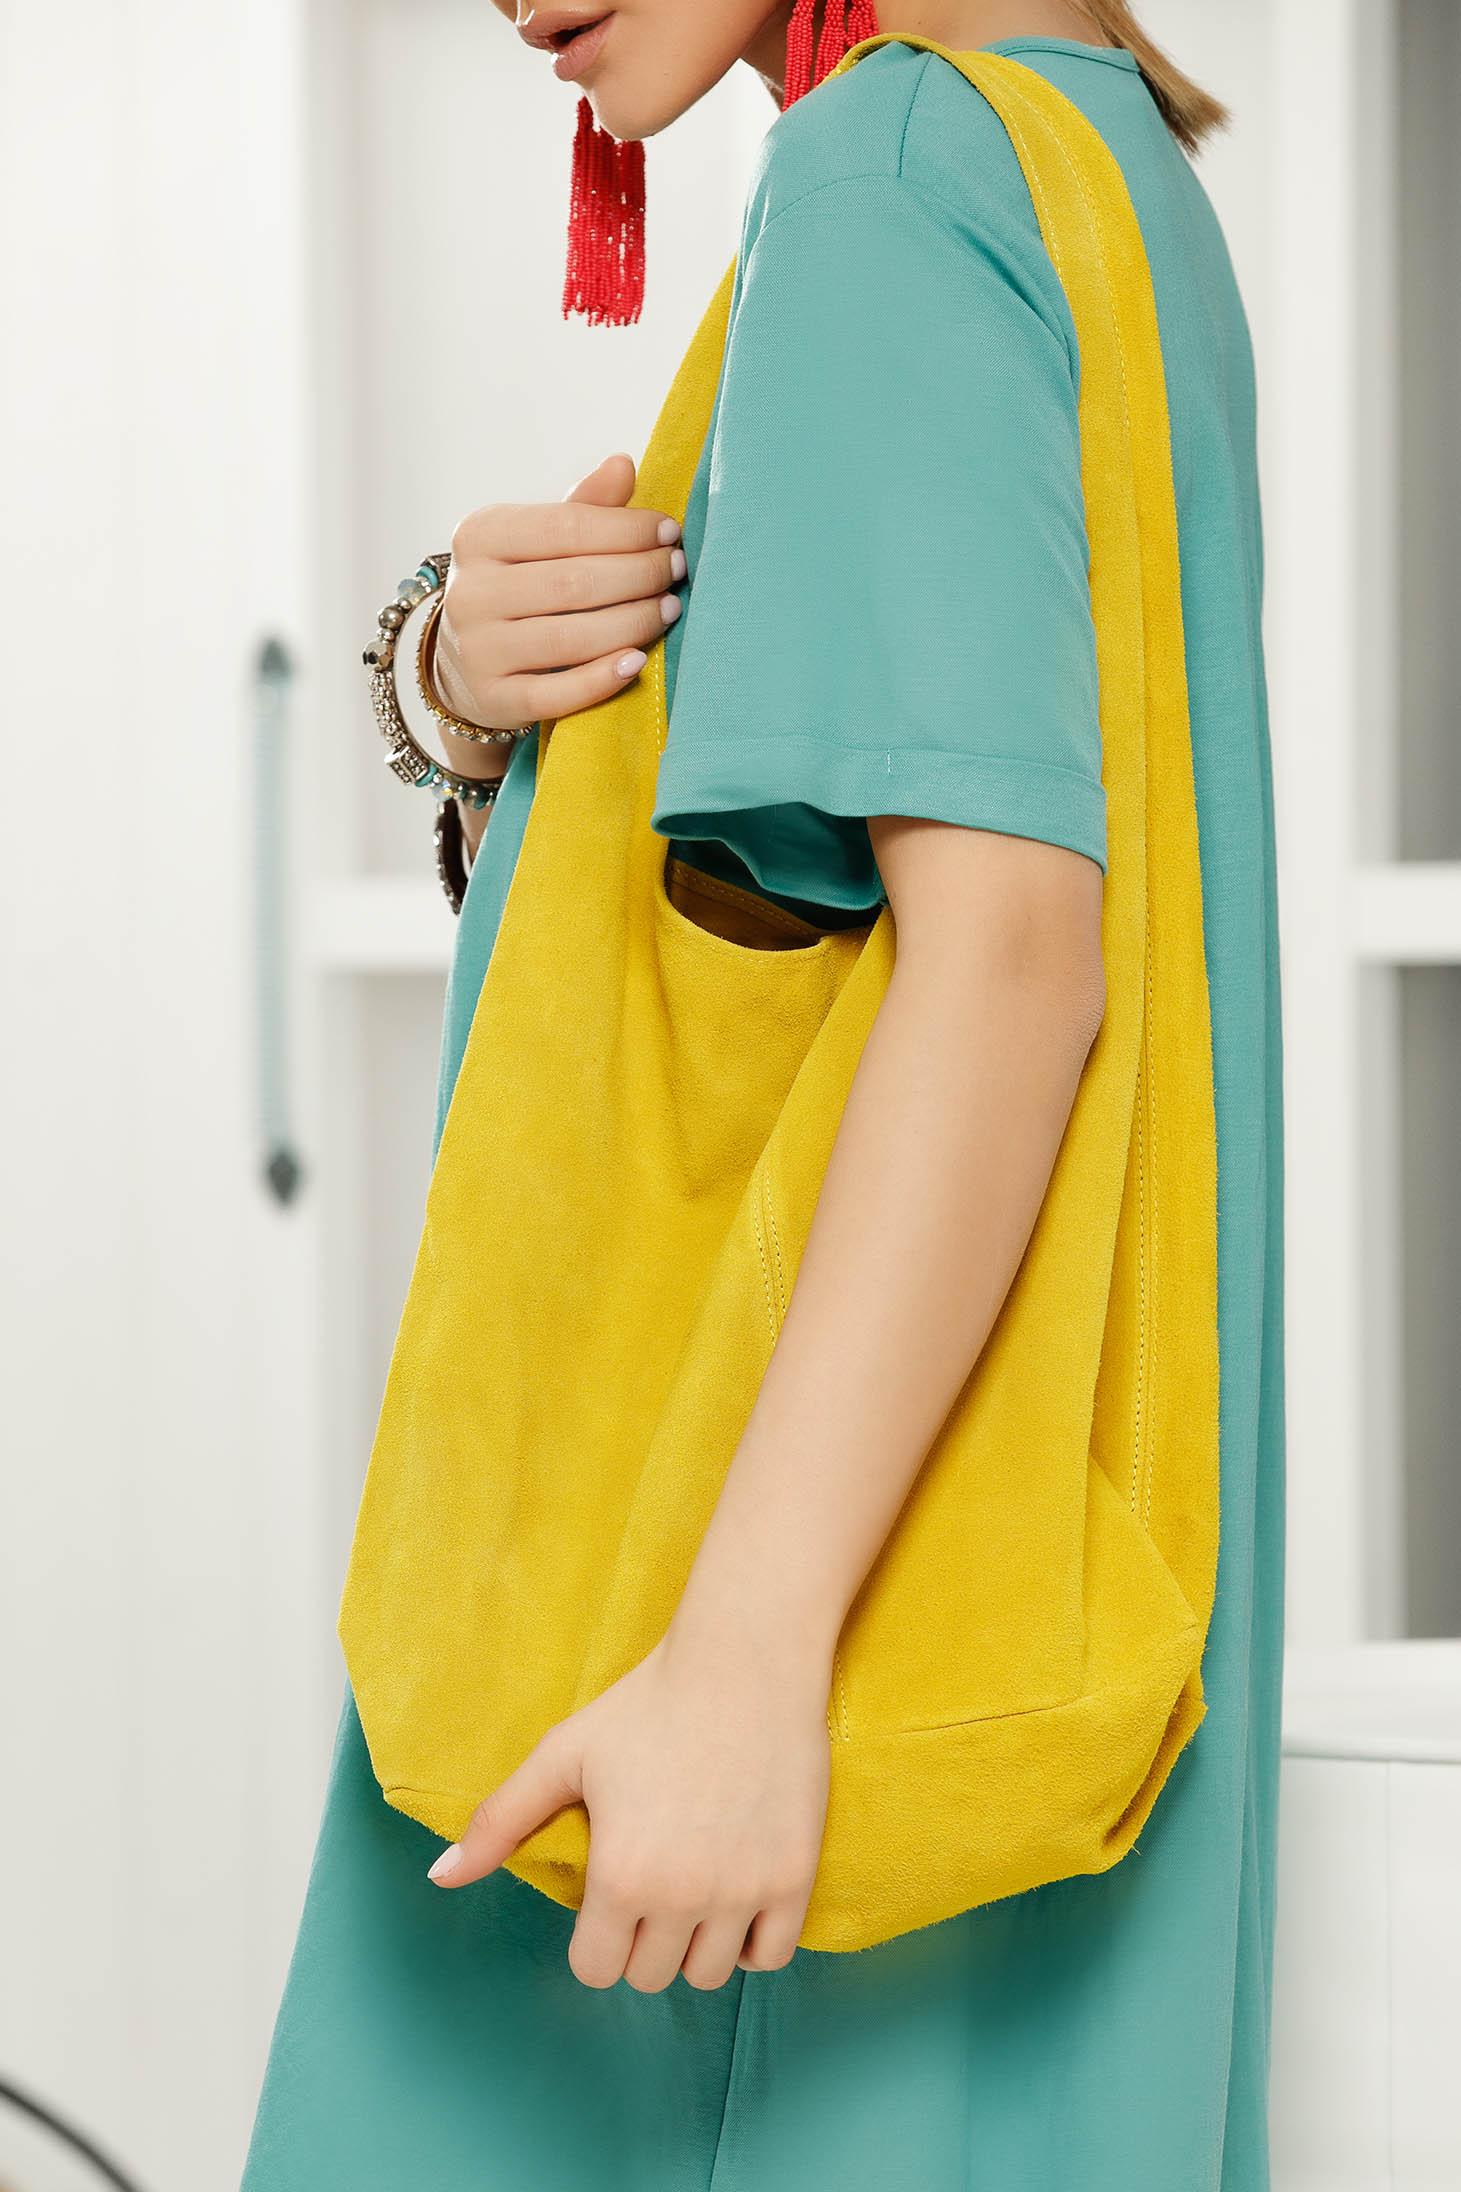 Geanta dama galbena casual cu manere de lungime medie si accesoriu inclus